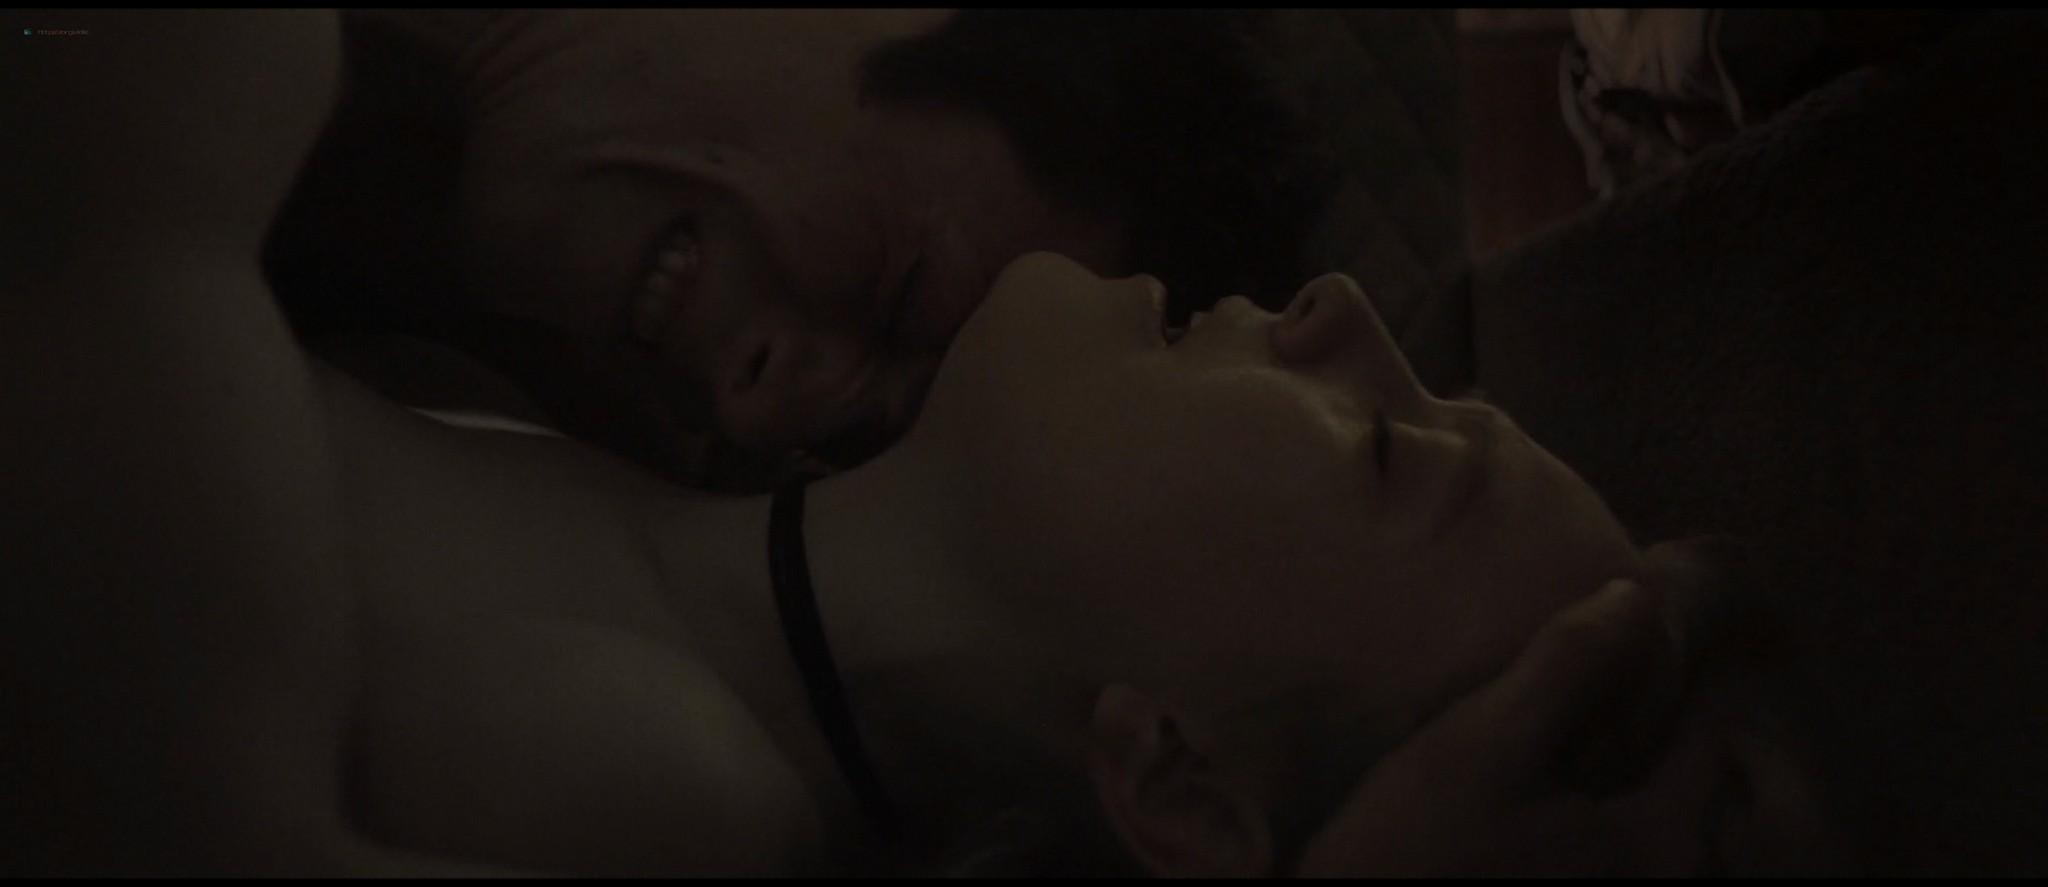 Dakota Fanning hot sex Evan Rachel Wood sexy - Viena and the Fantomes (2020) HD 1080p Web (8)